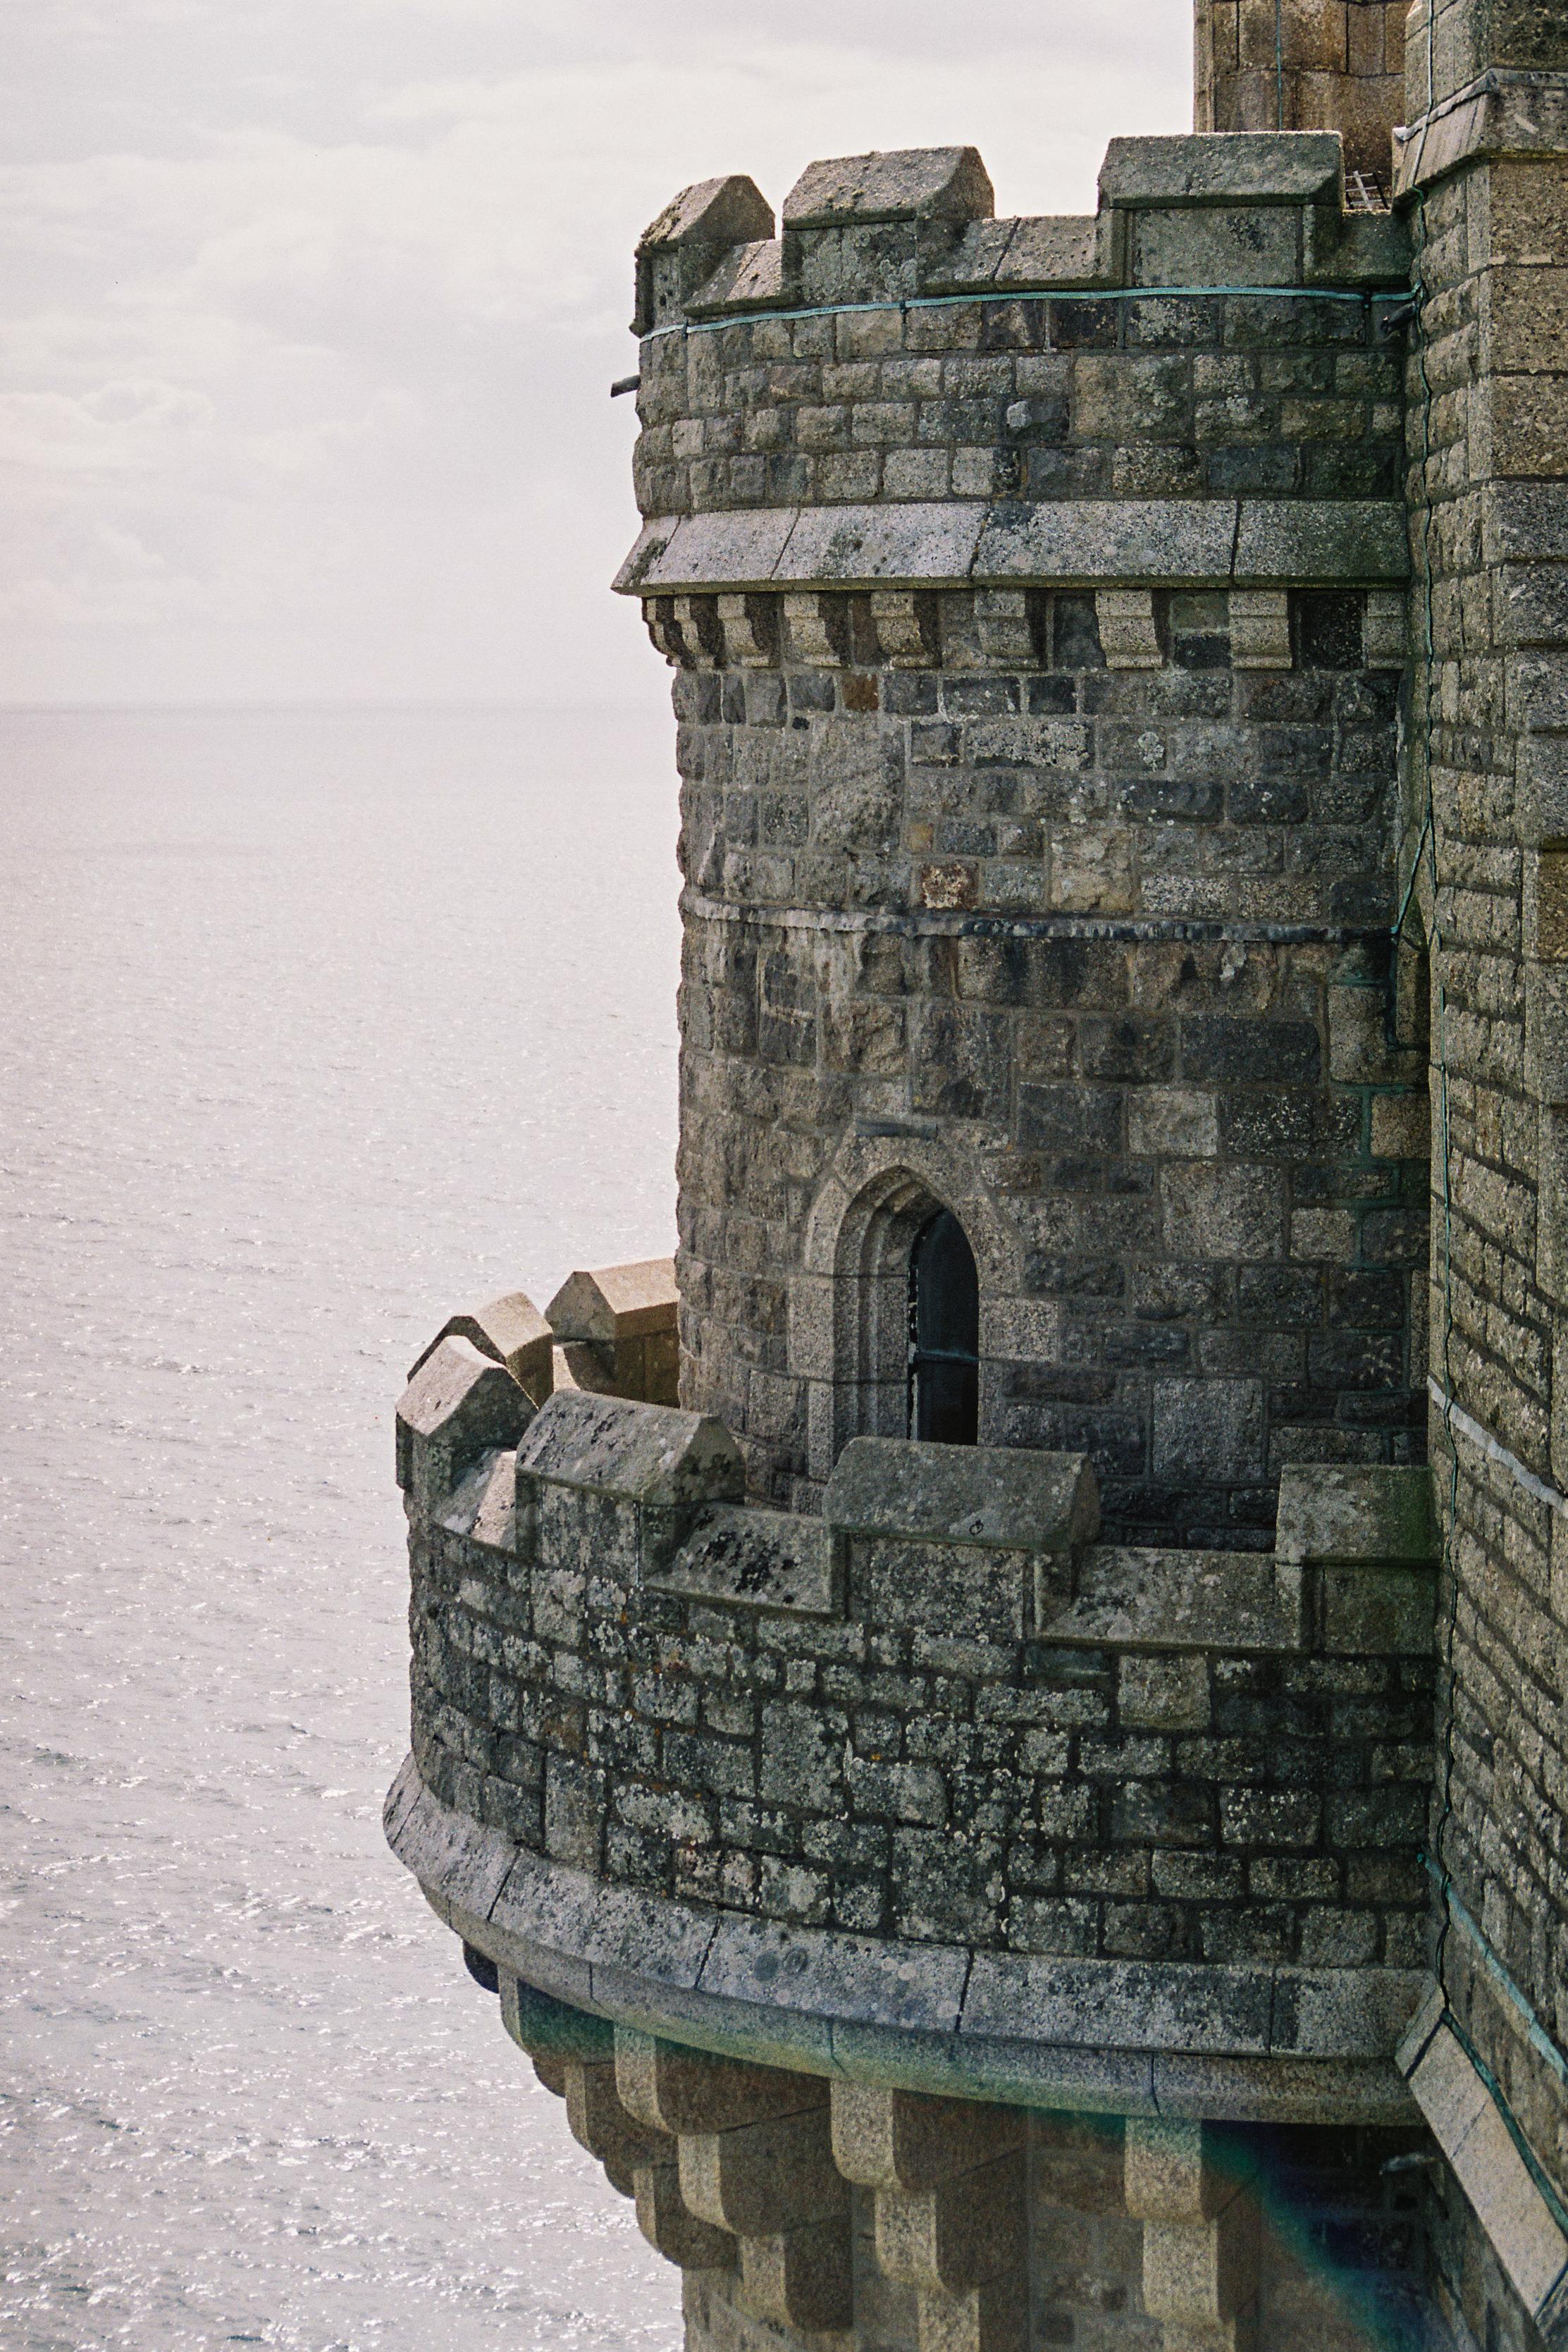 St Michael's Mount, Cornwall, England, United Kingdom